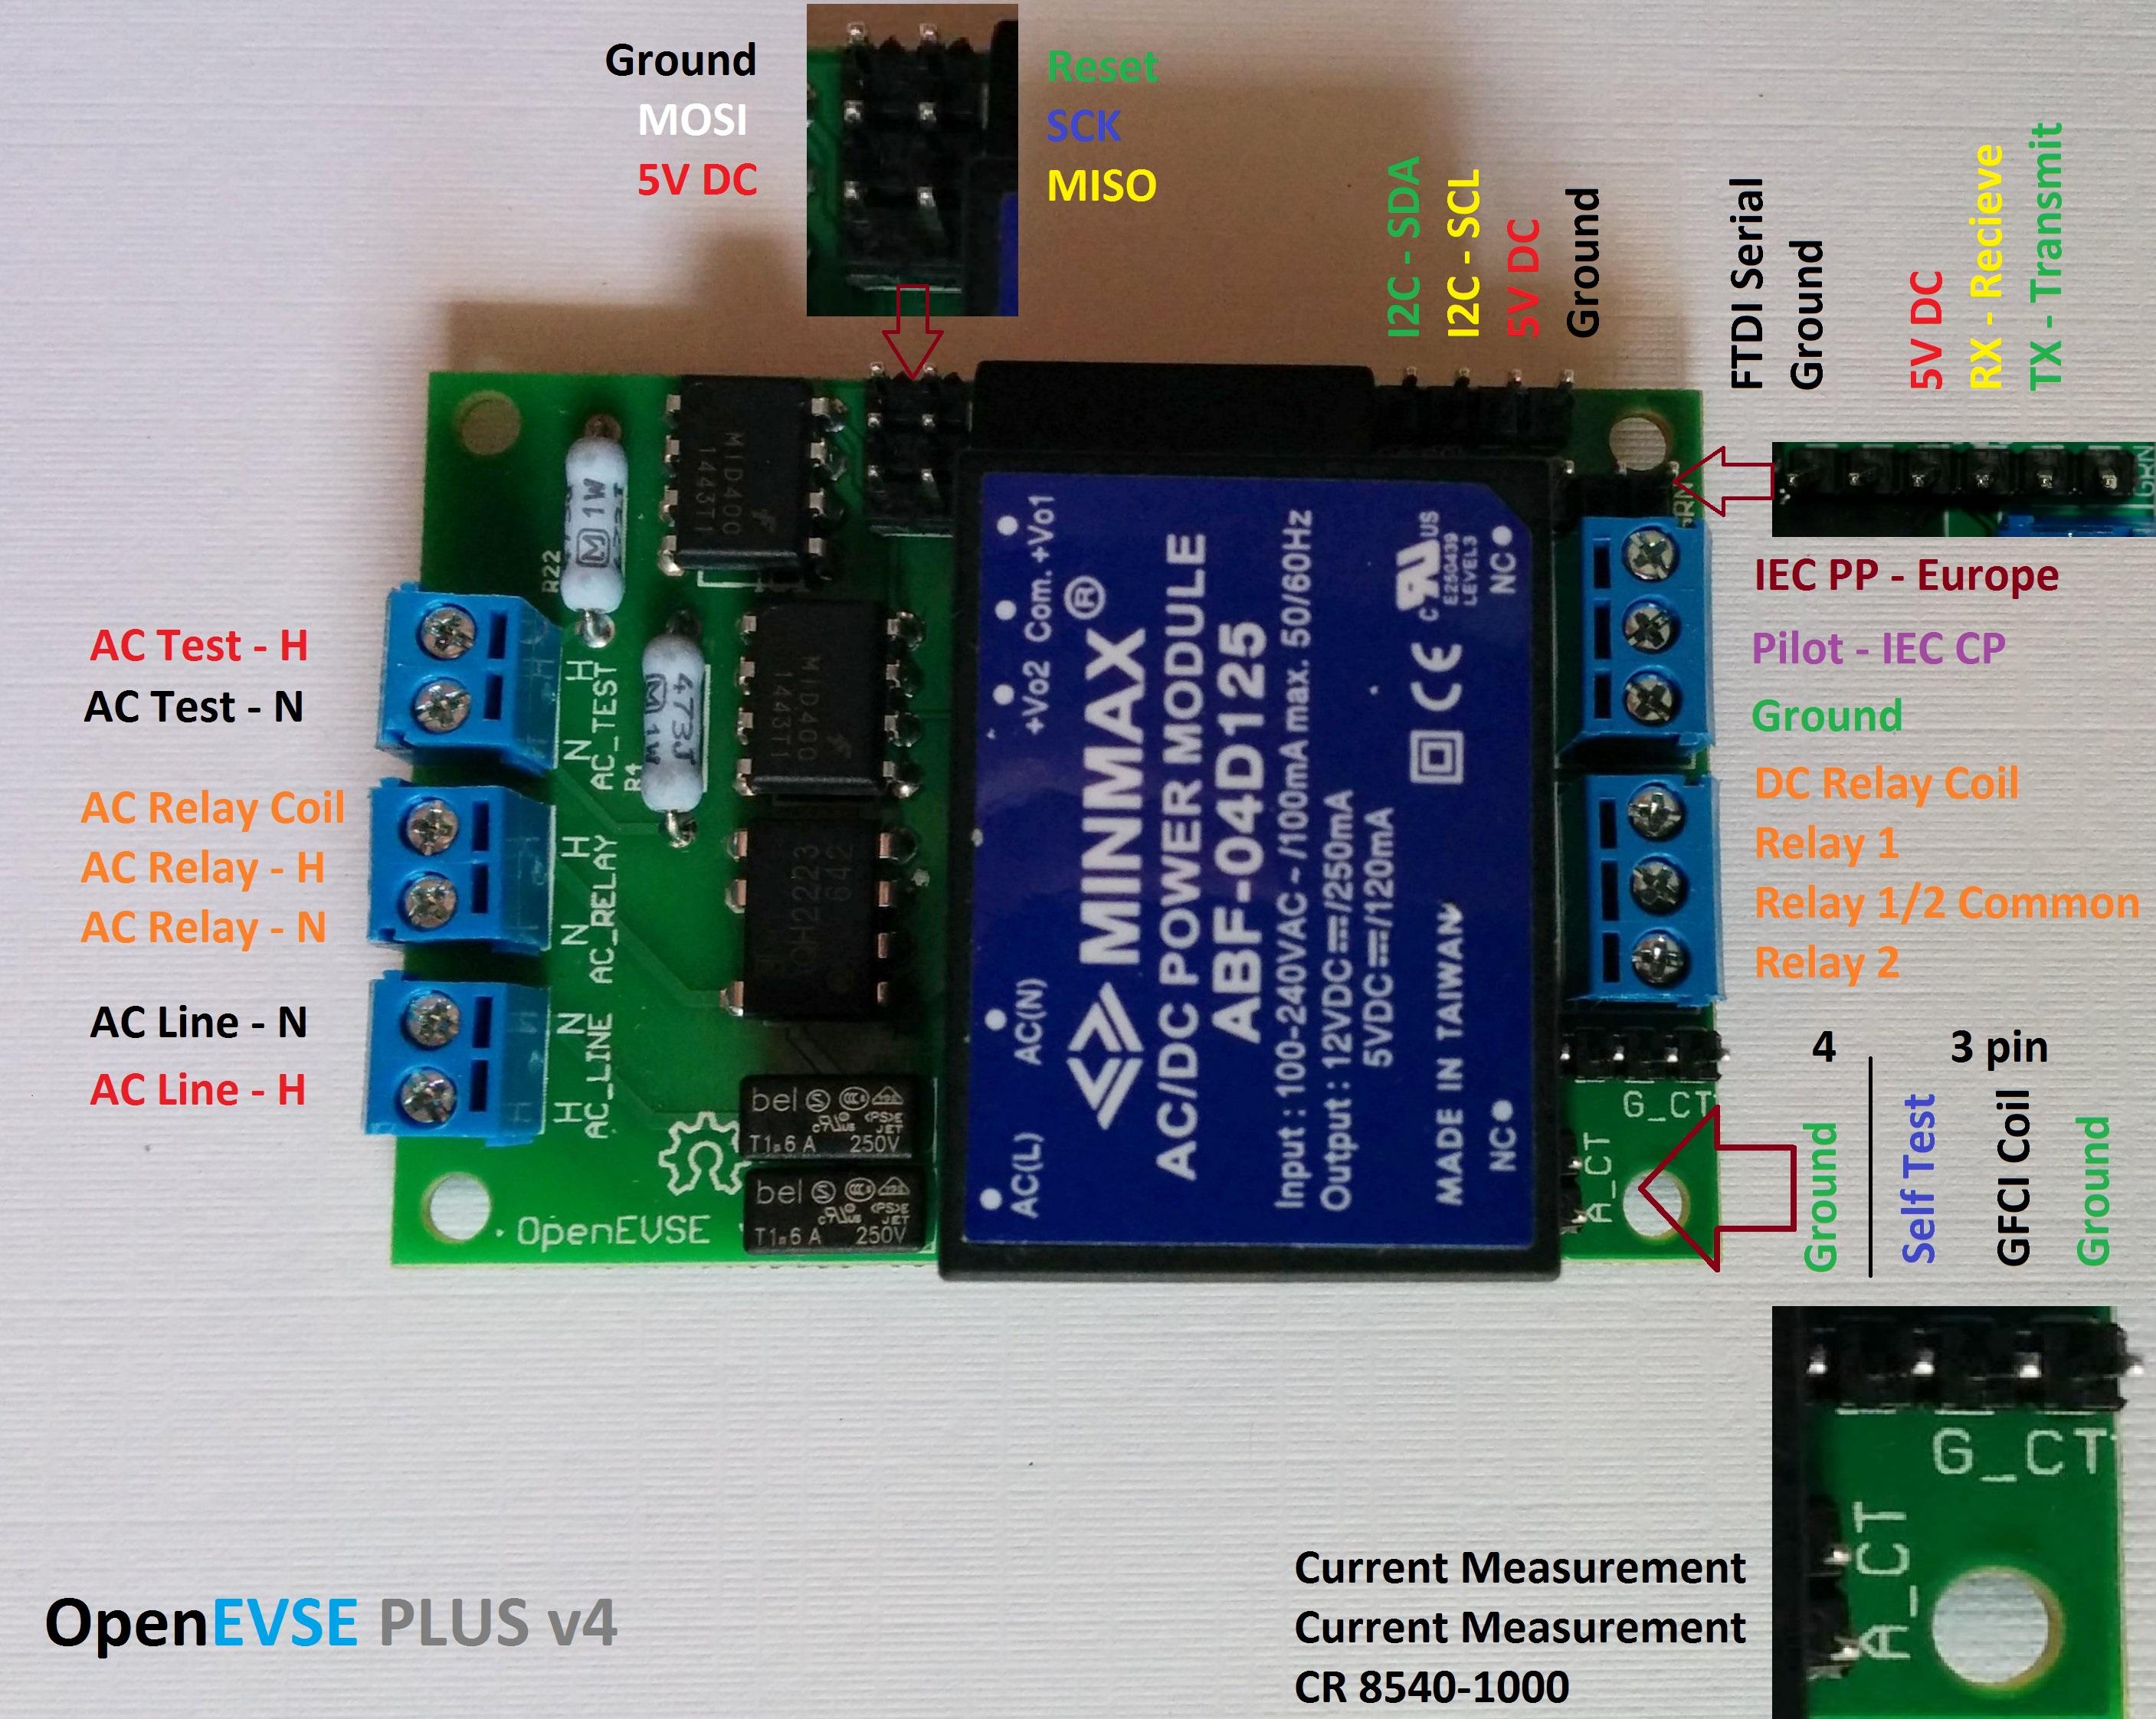 OpenEVSE Electric Vehicle controller v4 SAE J1772 IEC 61851